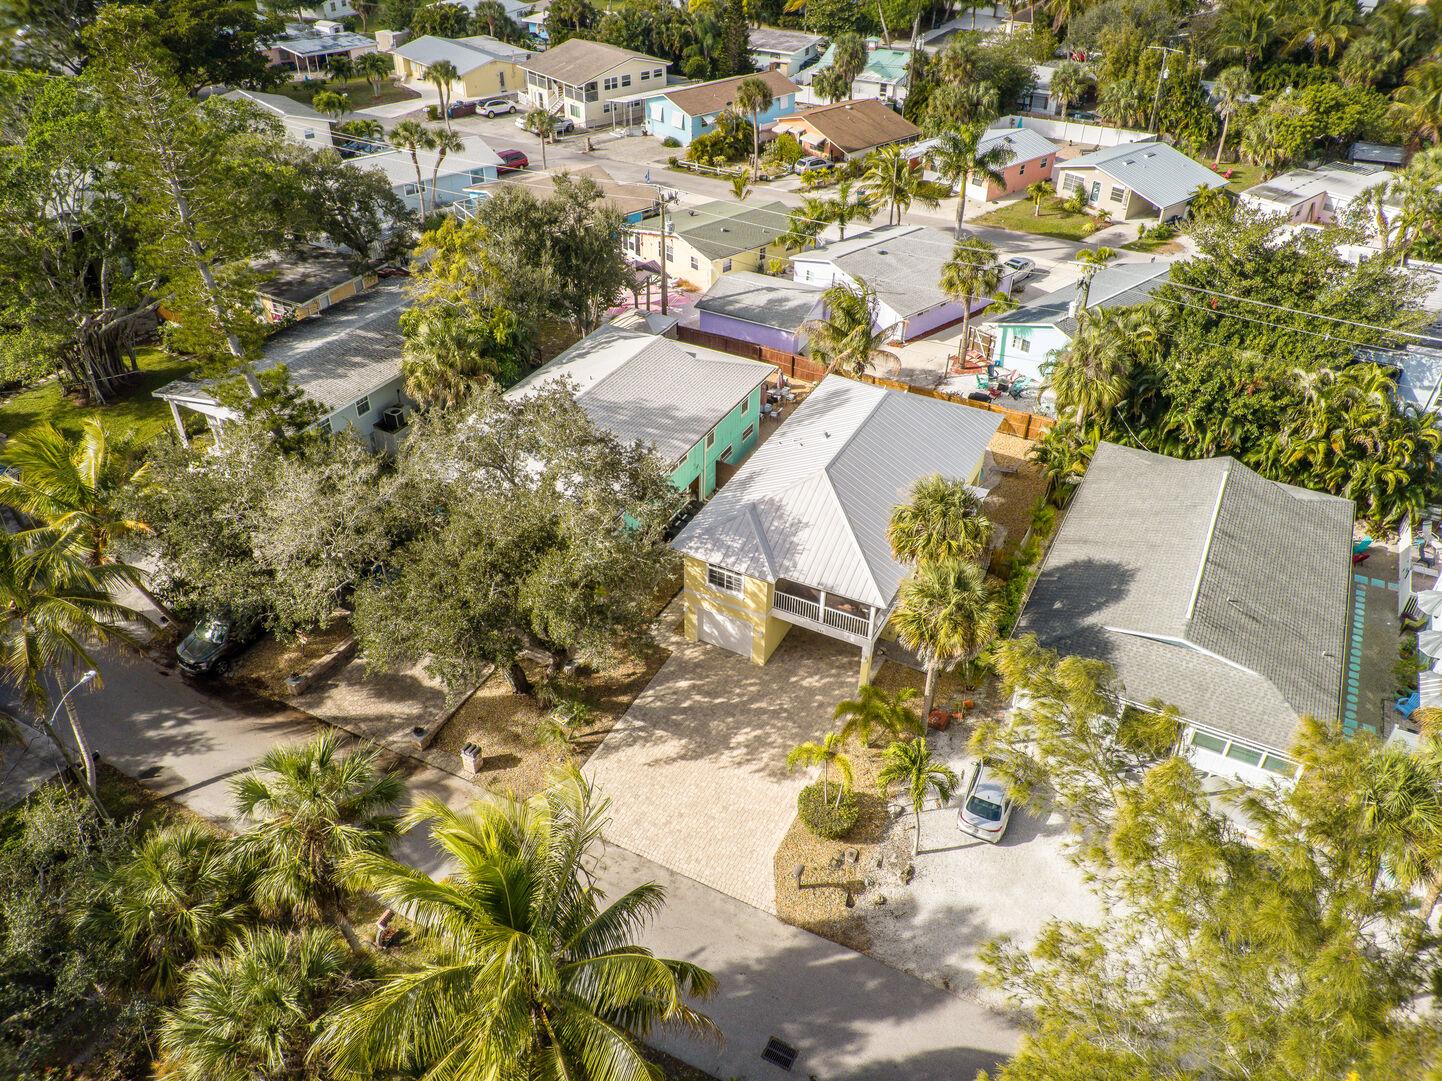 Arial view of the neighborhood